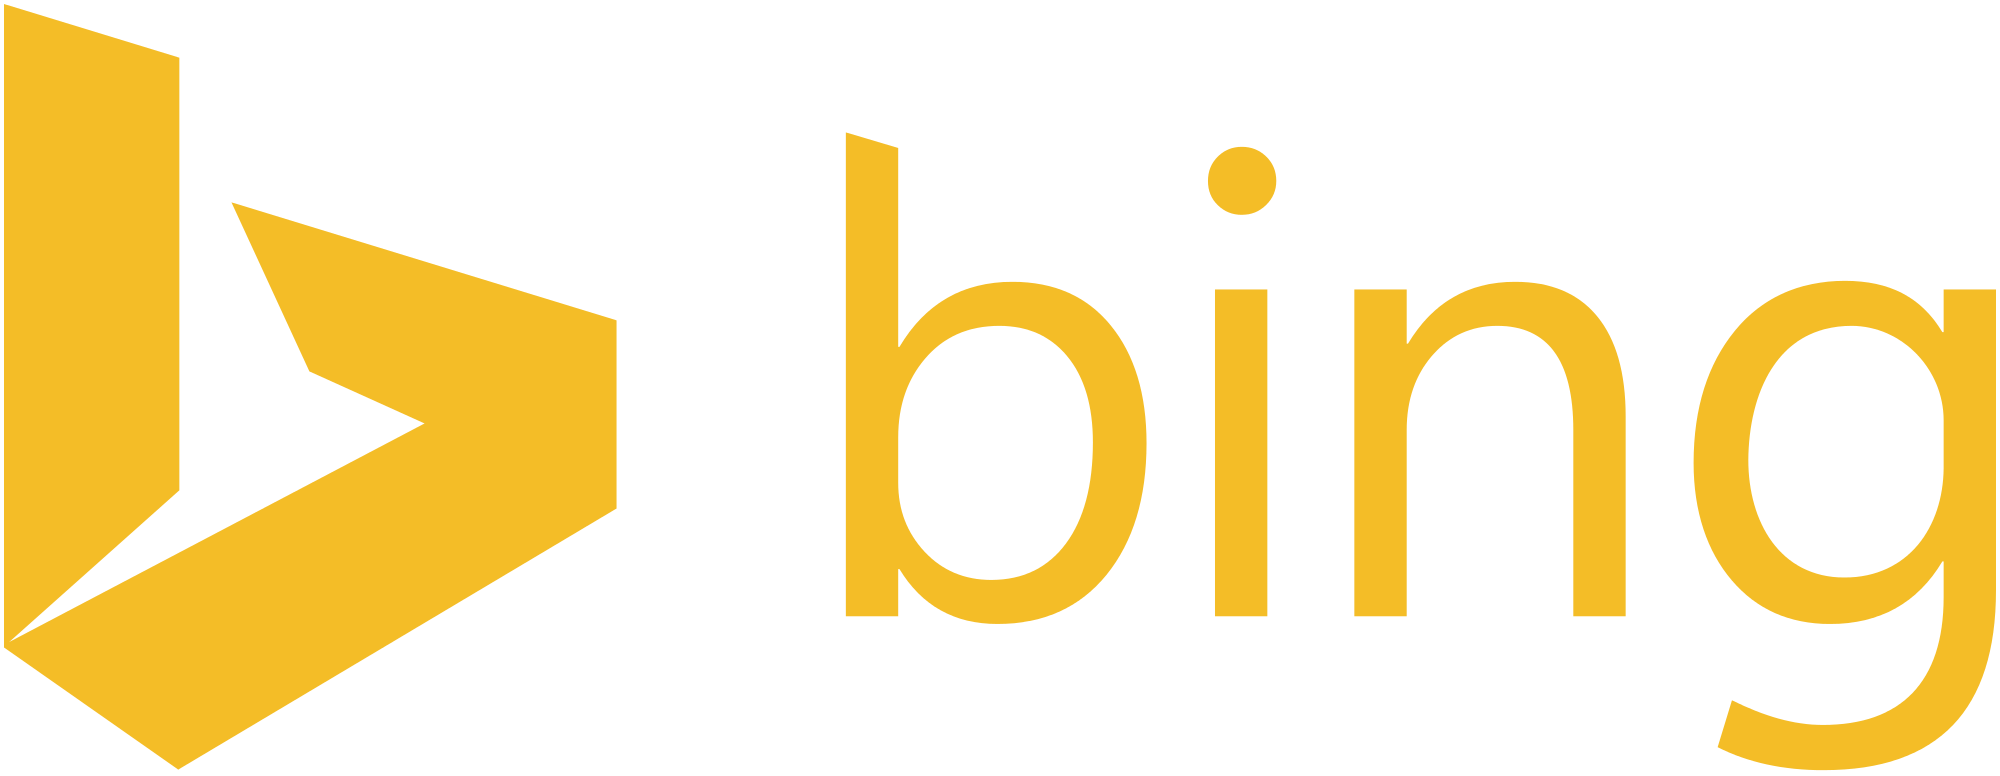 Bing - Internet Marketing Los Angeles